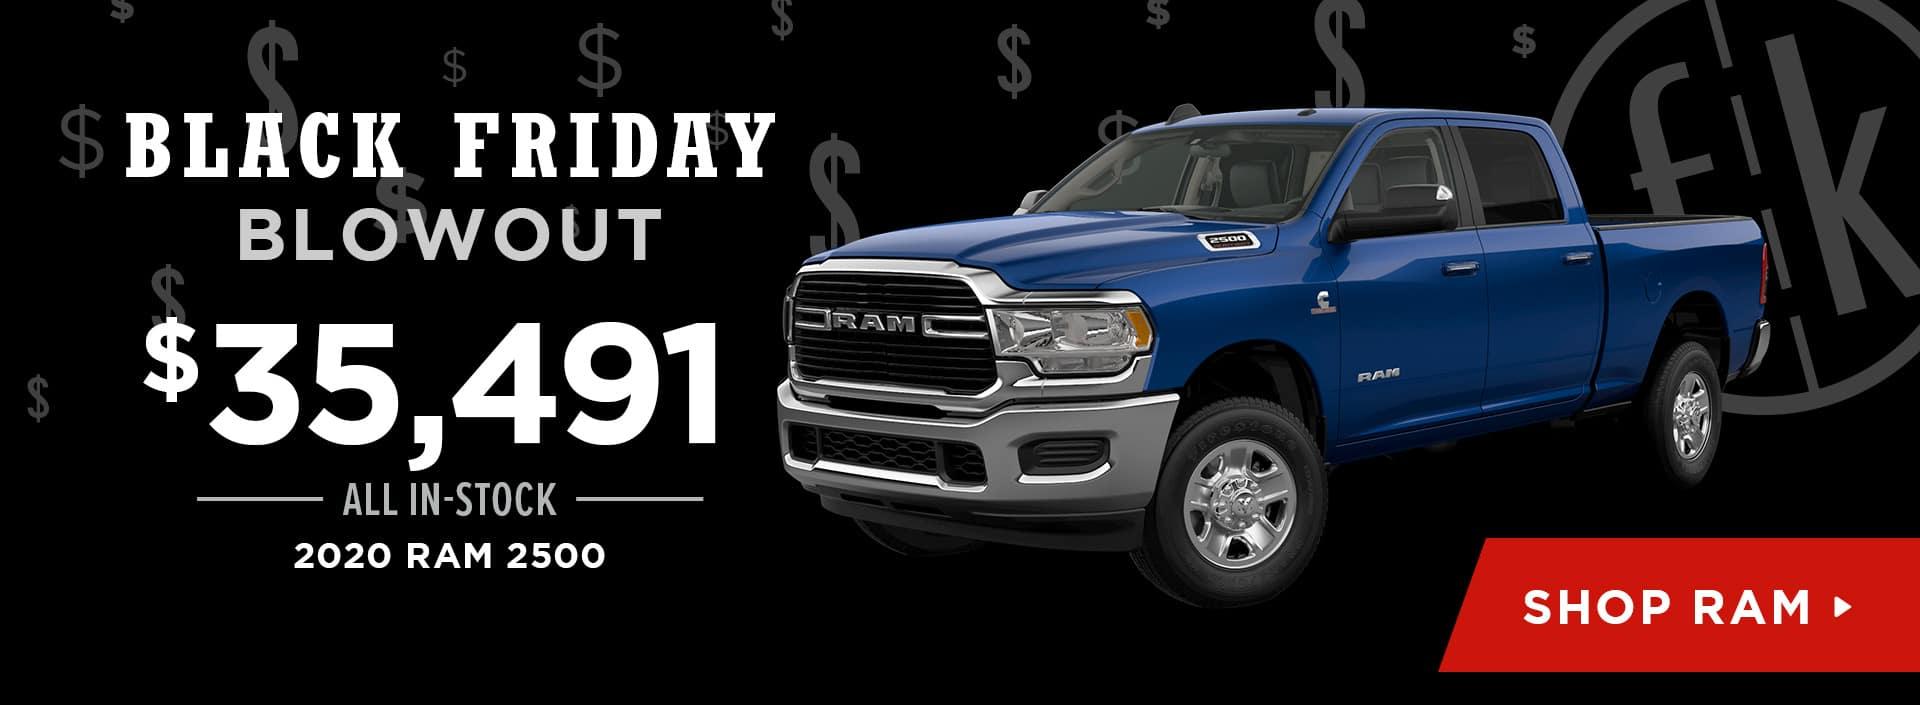 $35,491 All In-Stock 2020 RAM 2500